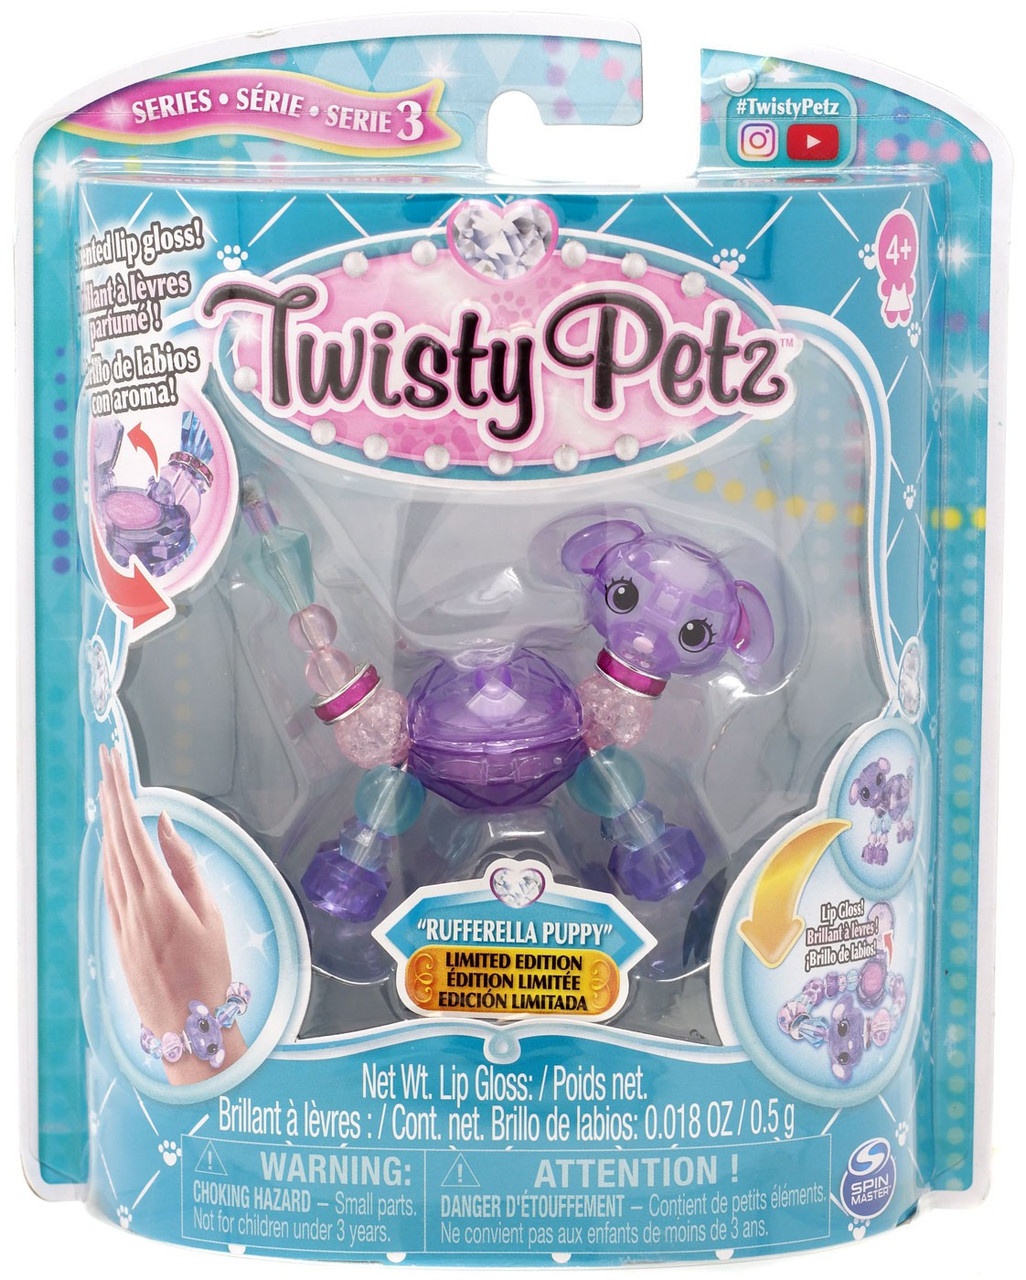 Twisty Petz Purrball Kitty Spin Master LTD